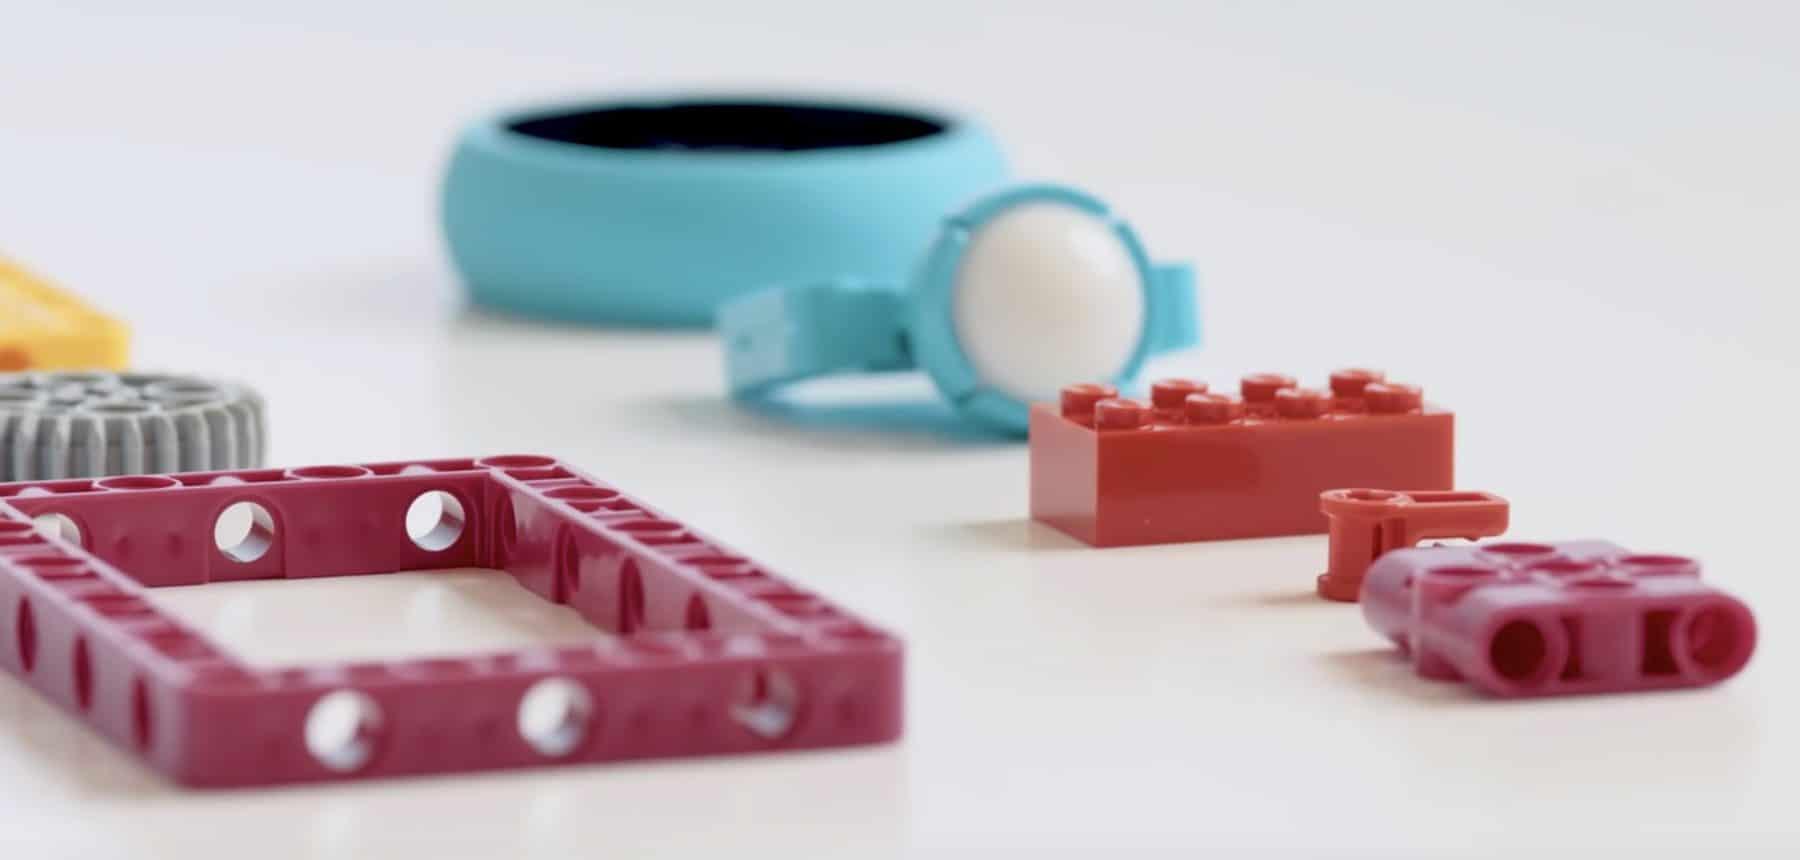 LEGO SPIKE Prime neue Elemente